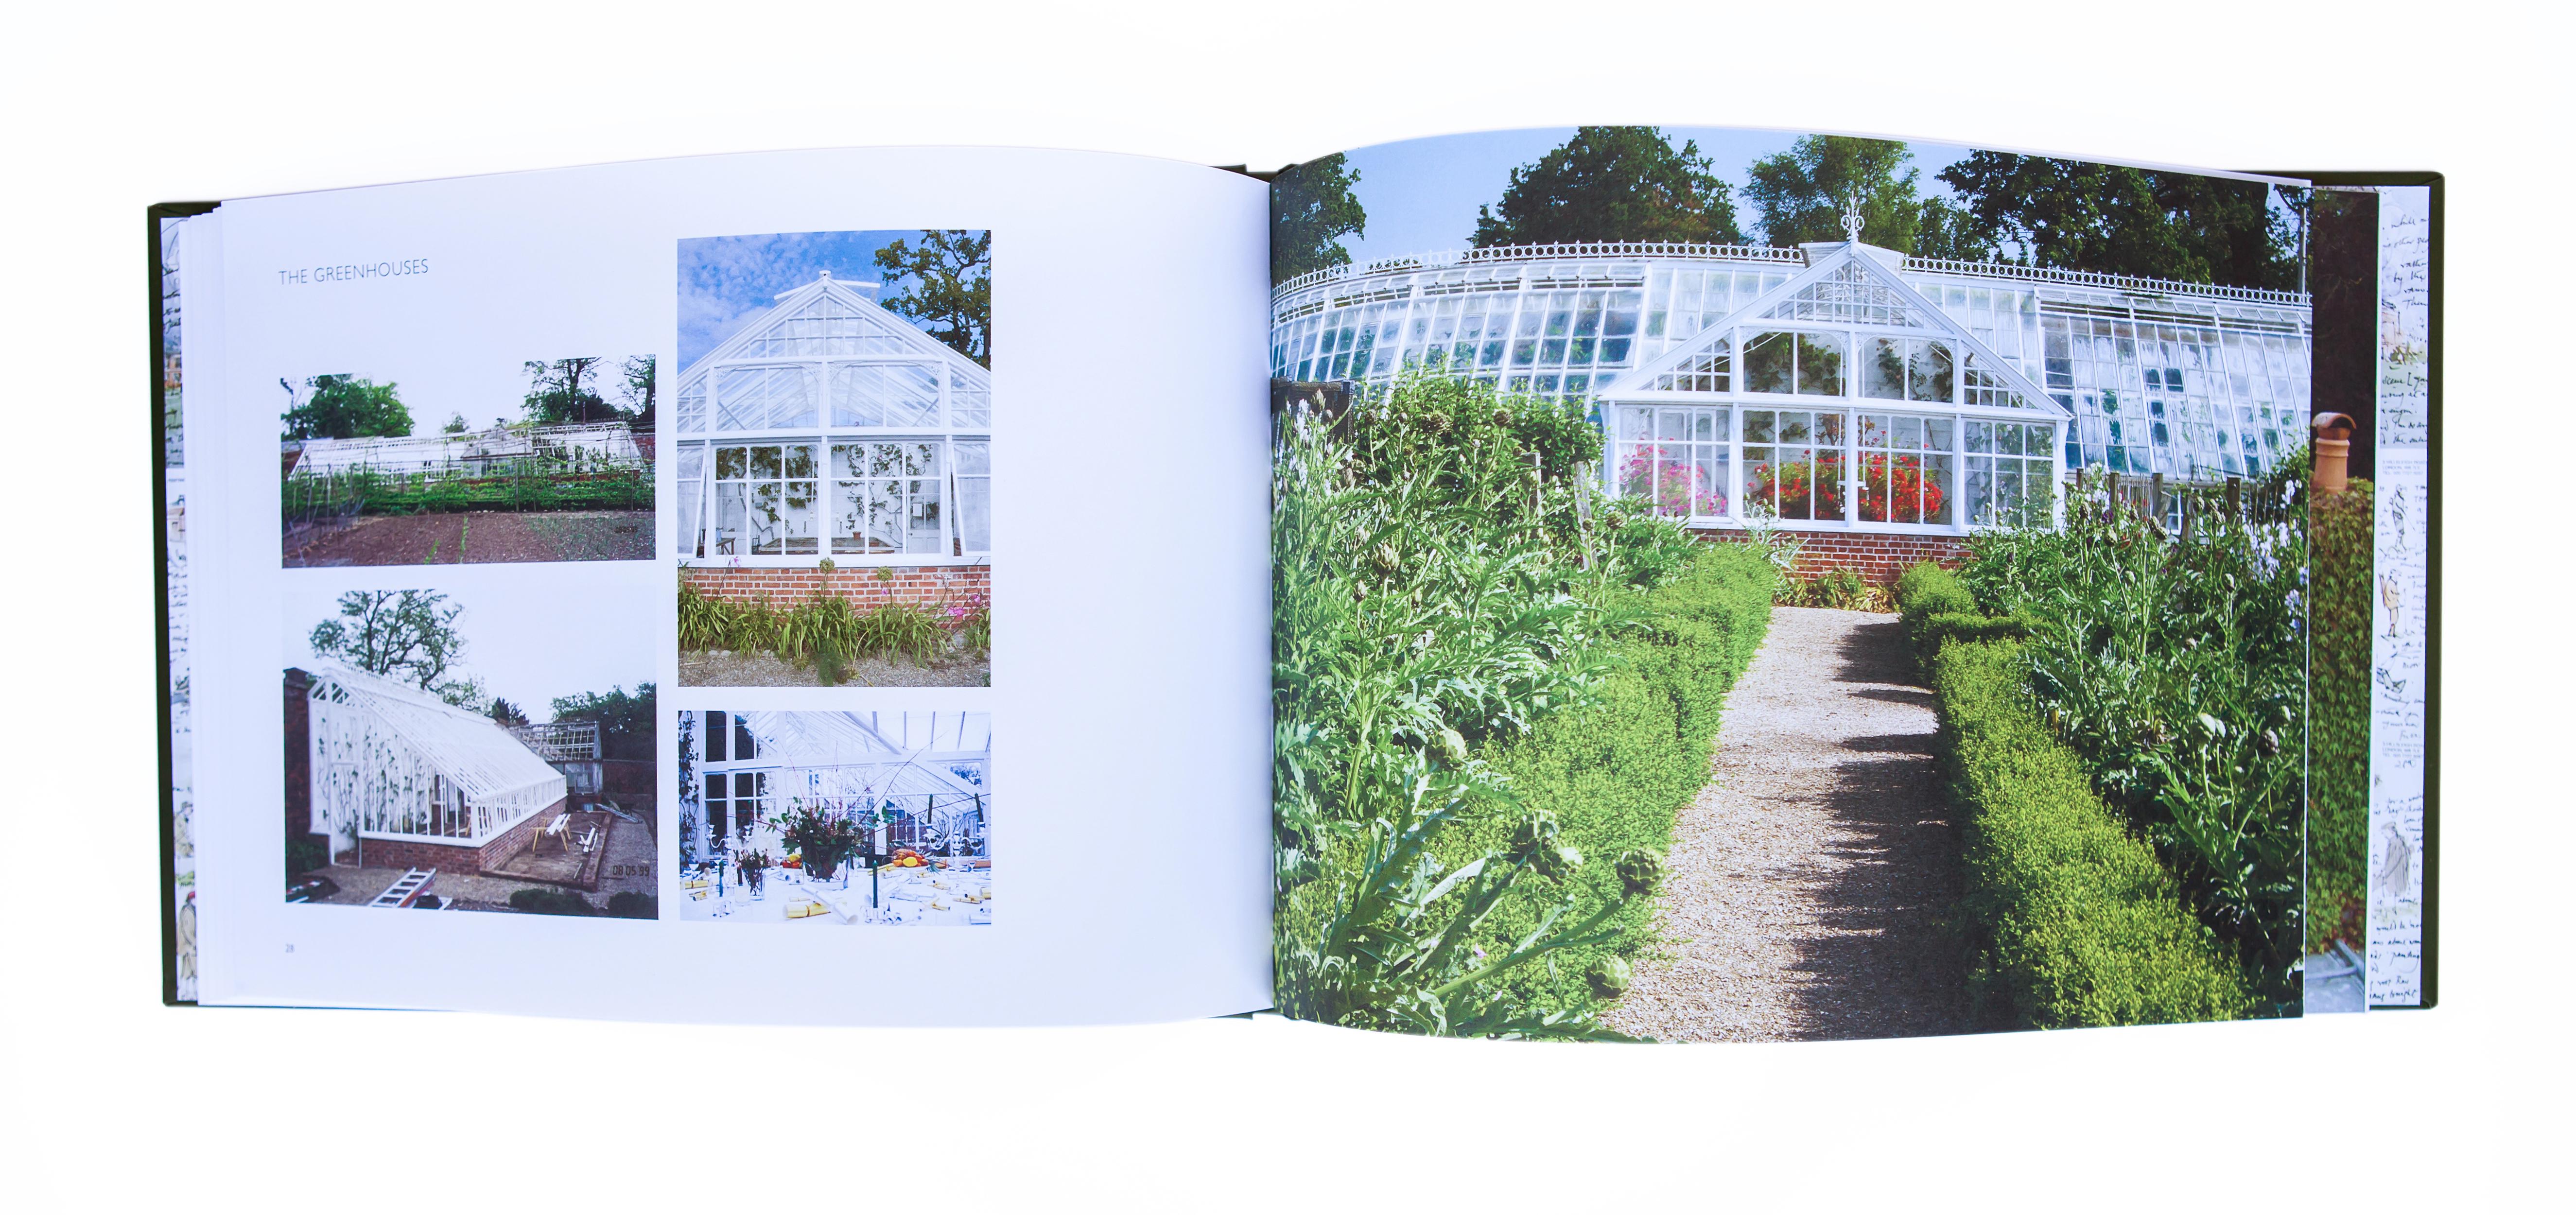 Raveningham Hall book inside